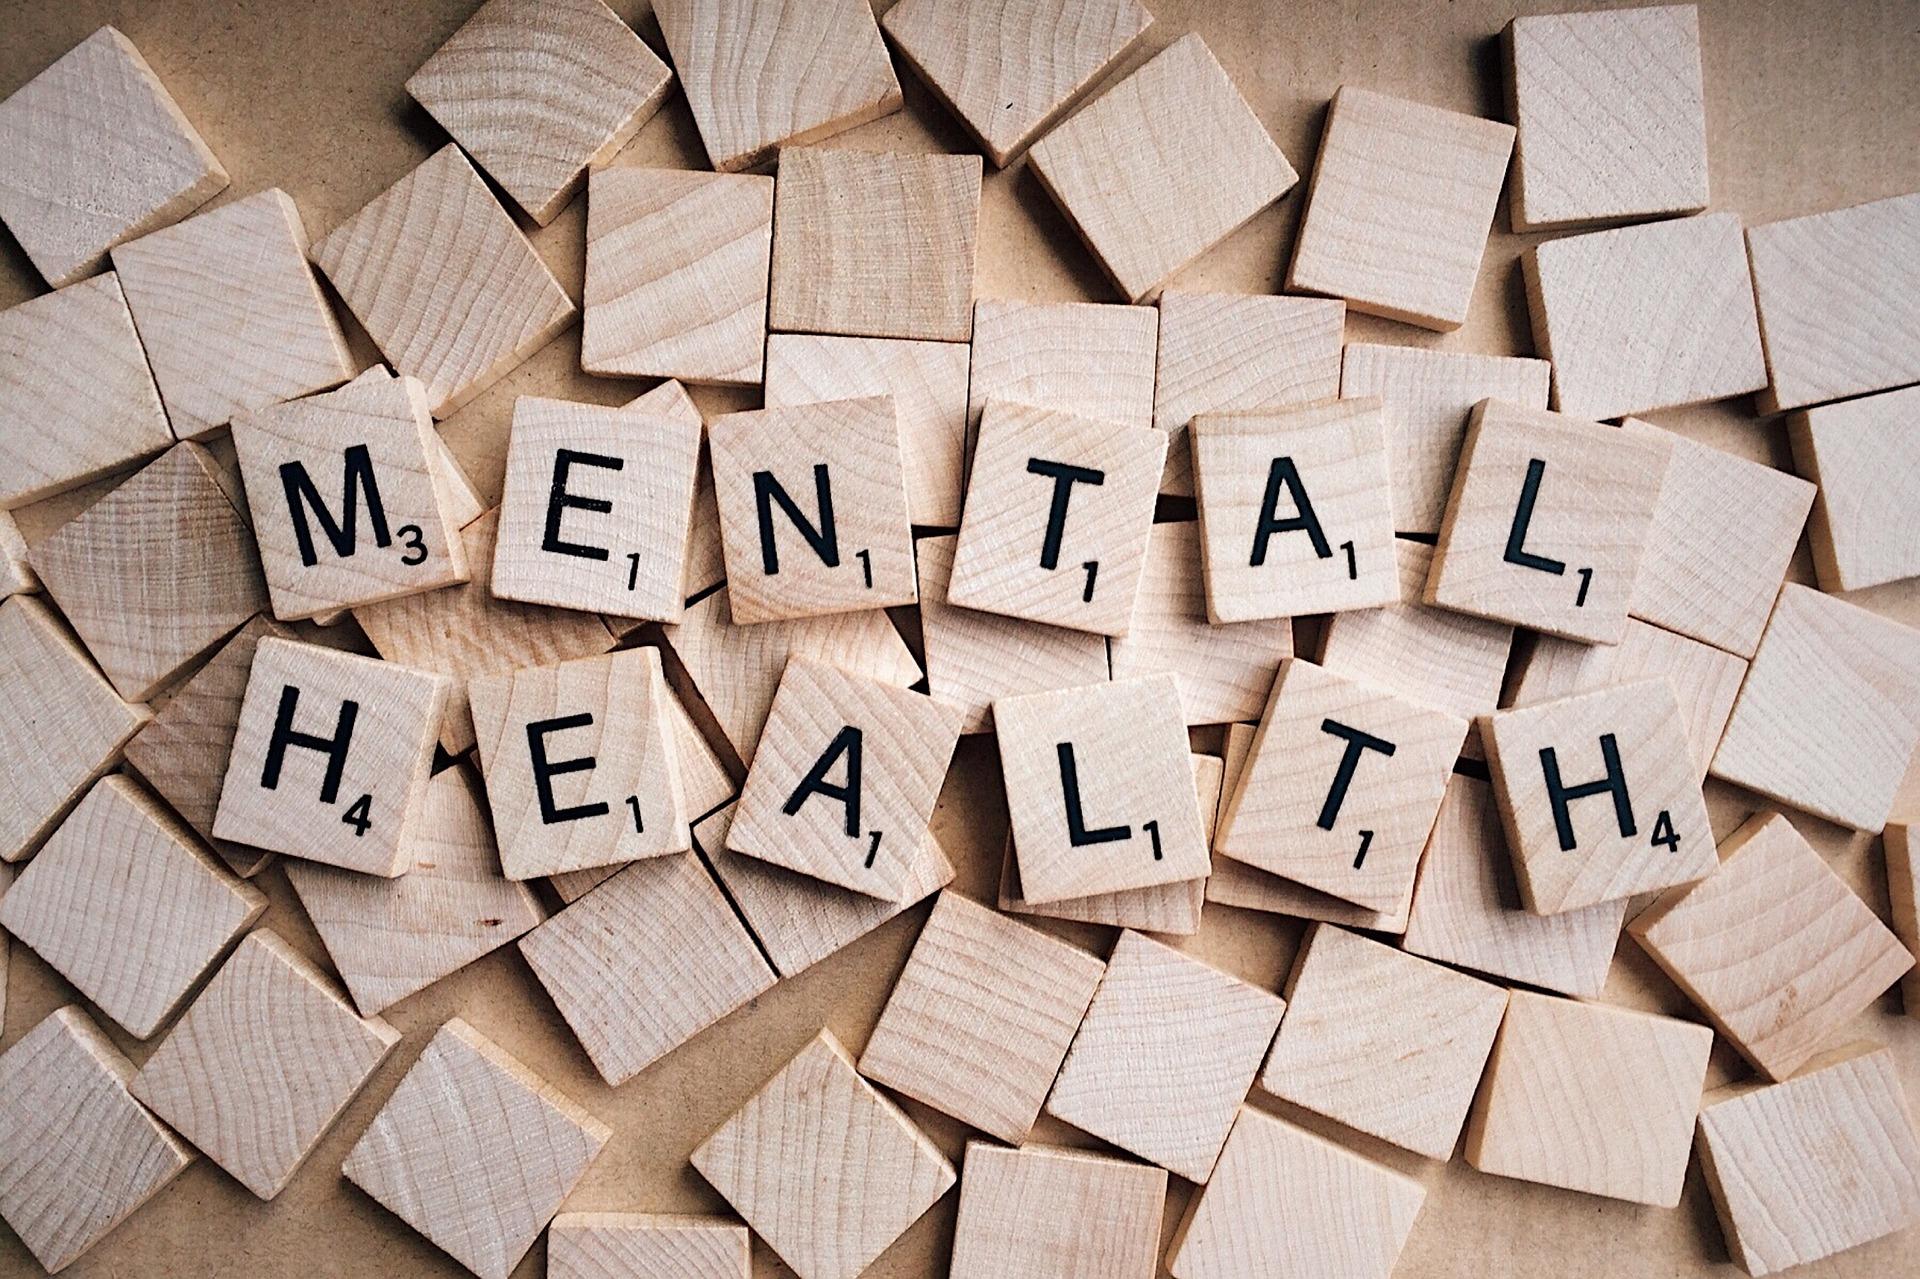 mental-health-2019924_1920.jpg